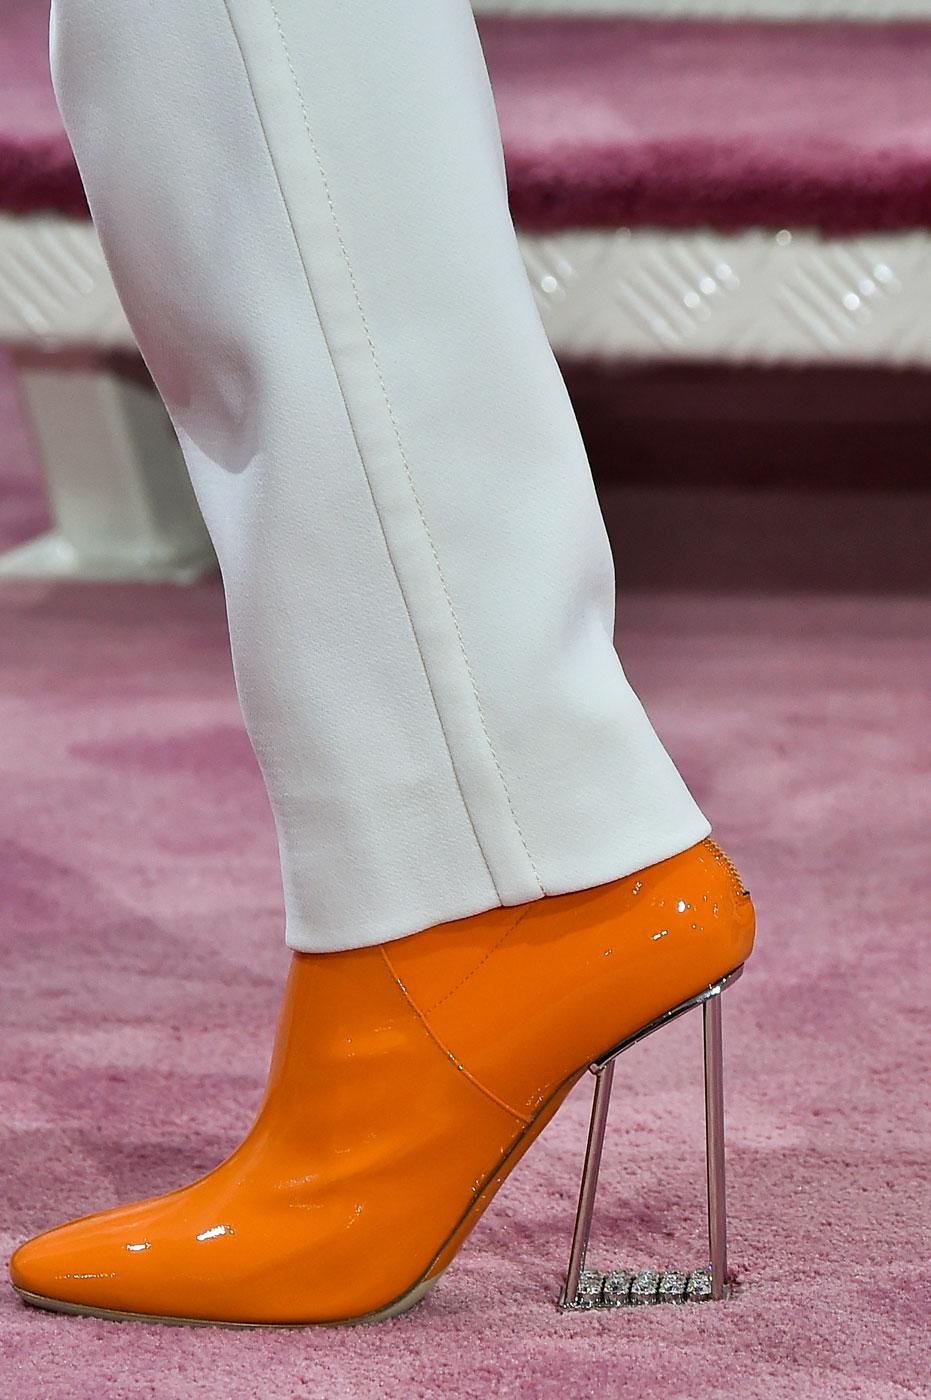 Christian-Dior-fashion-runway-show-close-ups-haute-couture-paris-spring-summer-2015-the-impression-133